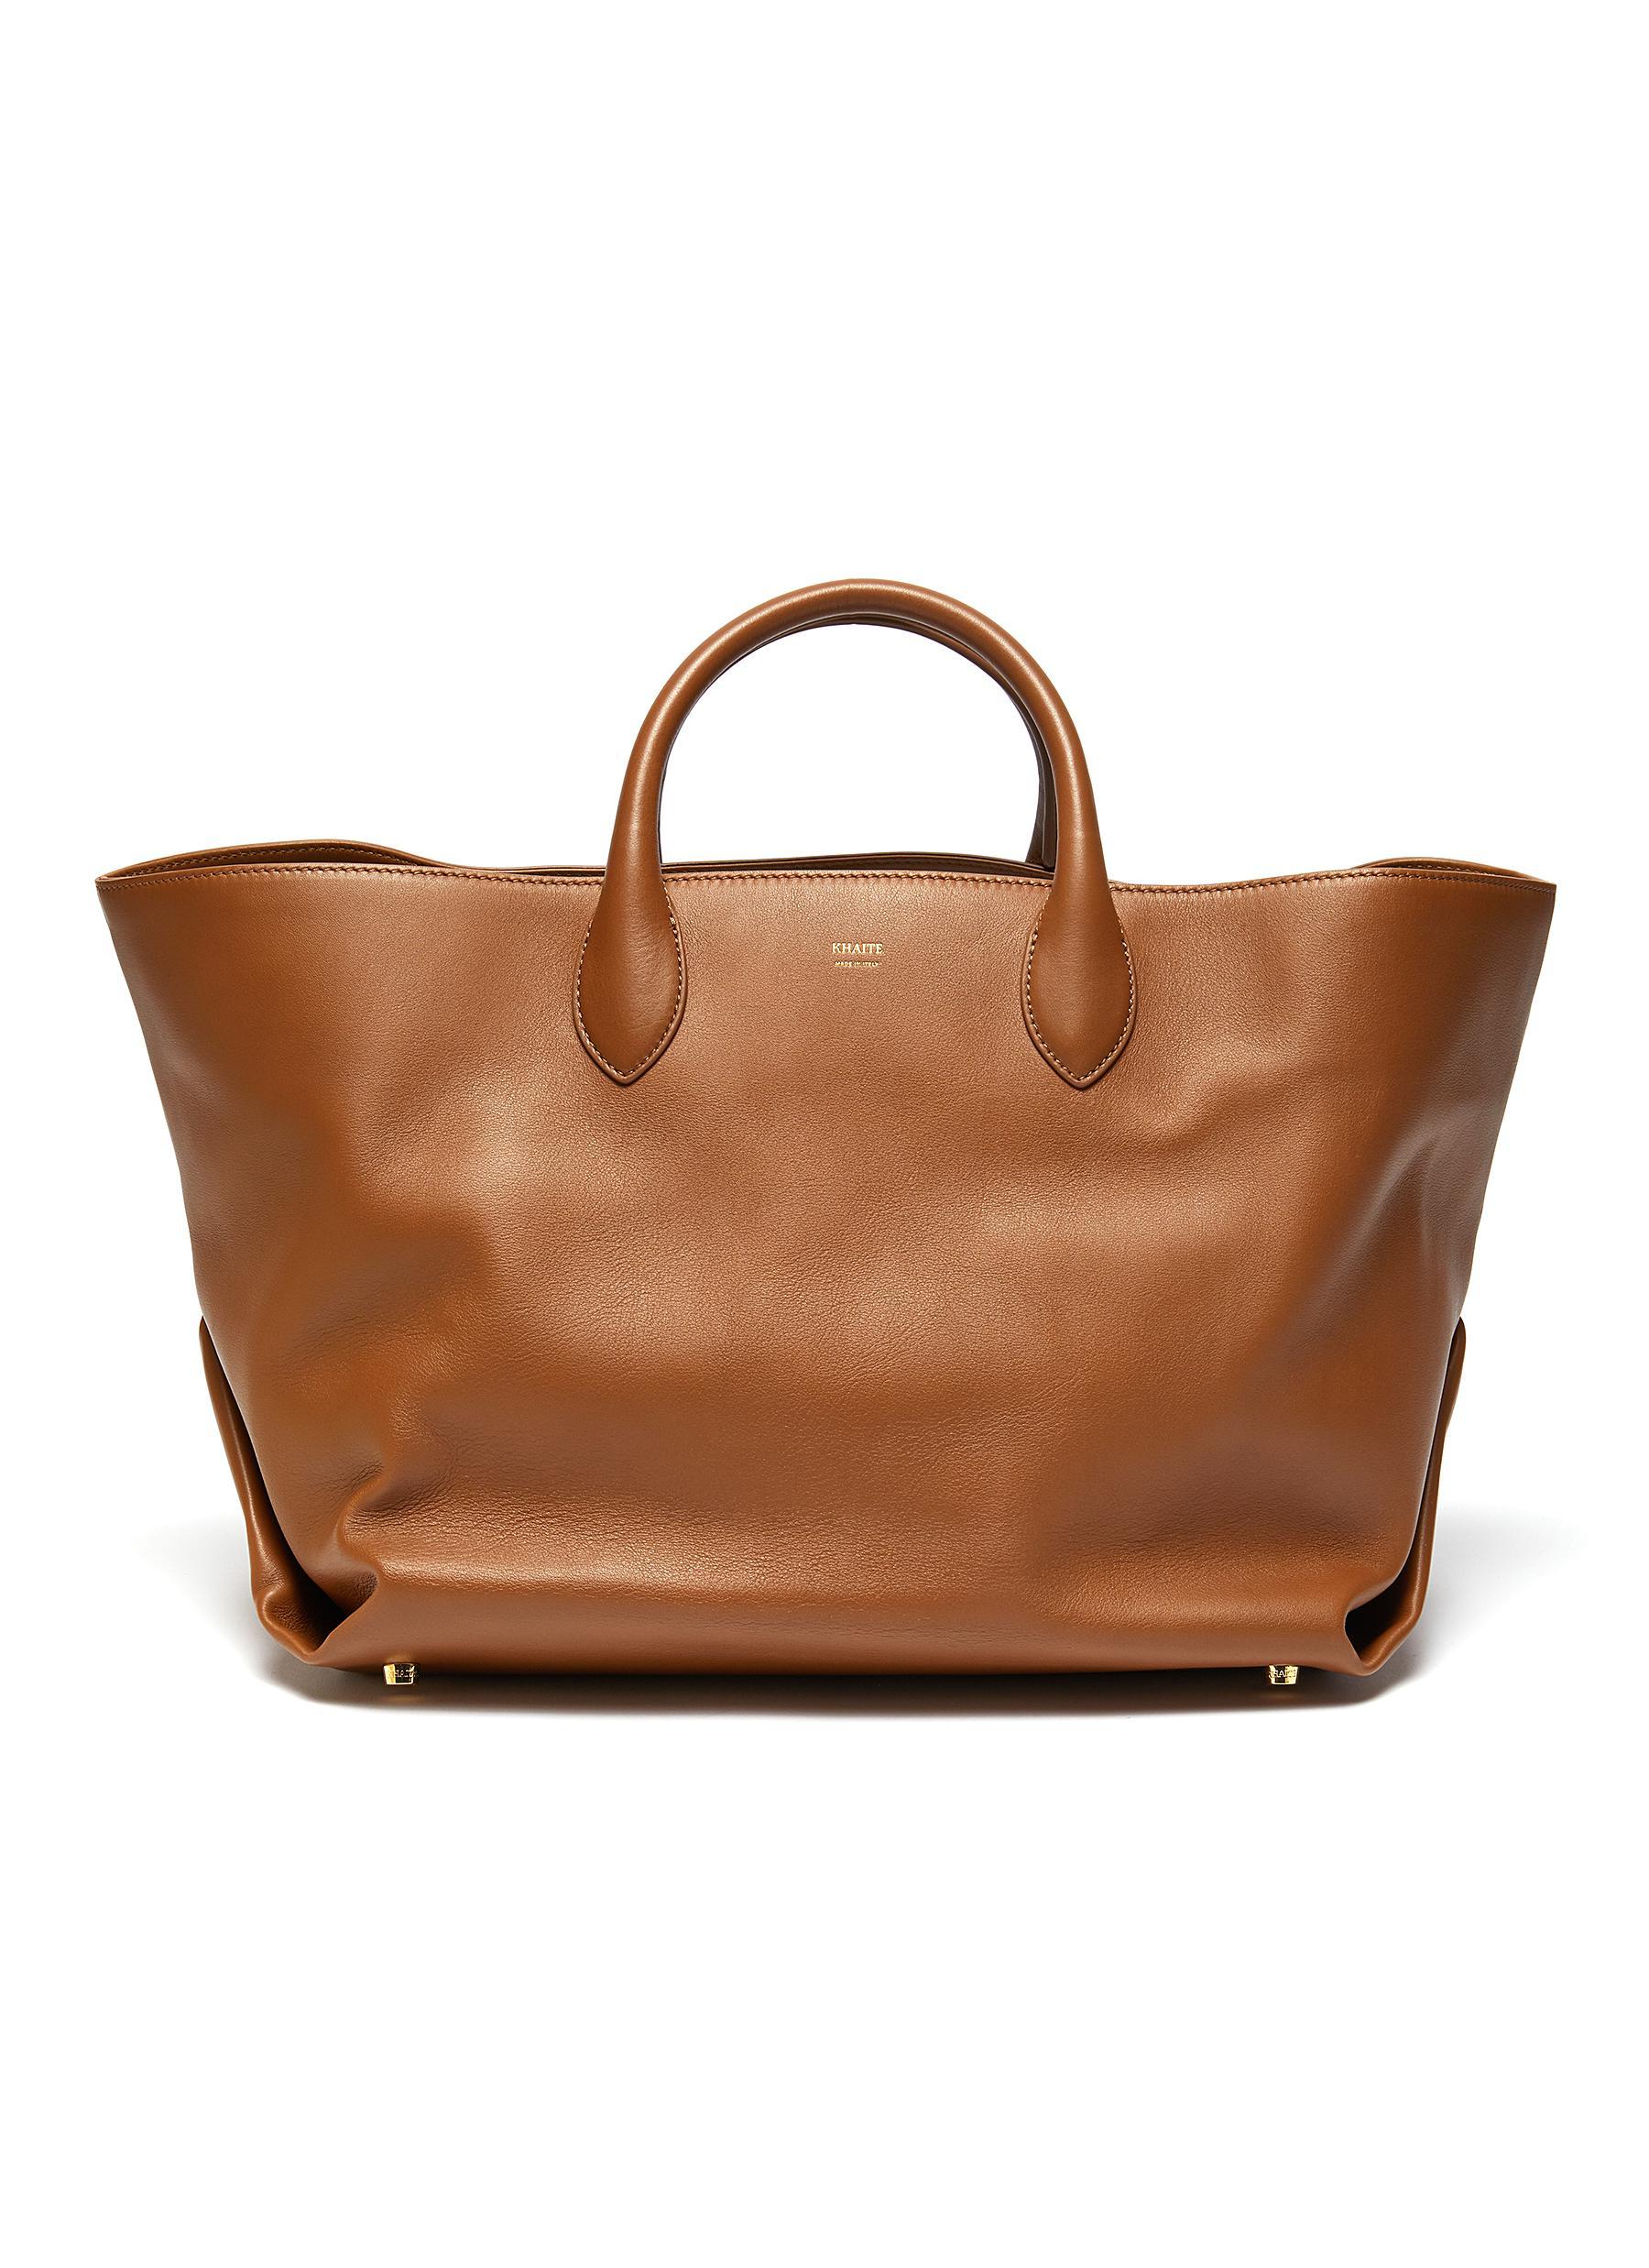 Amelia' envelop pleat medium tote bag